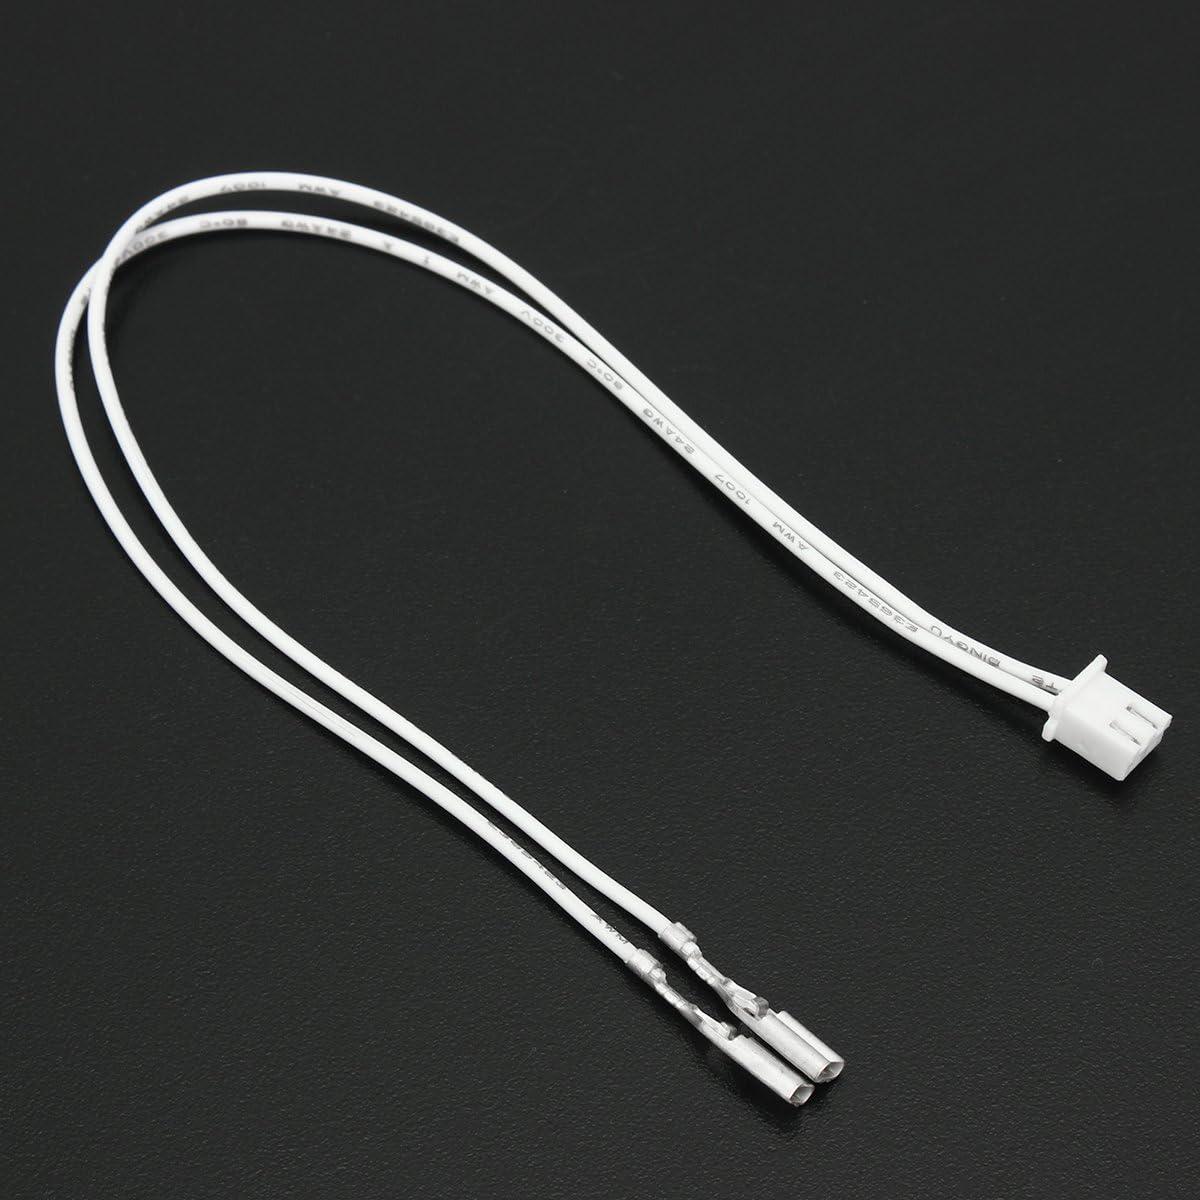 Fincos Zero Delay USB Encoder Arcade PC 5Pin Joystick Wiring Happ Buttons Cable Games